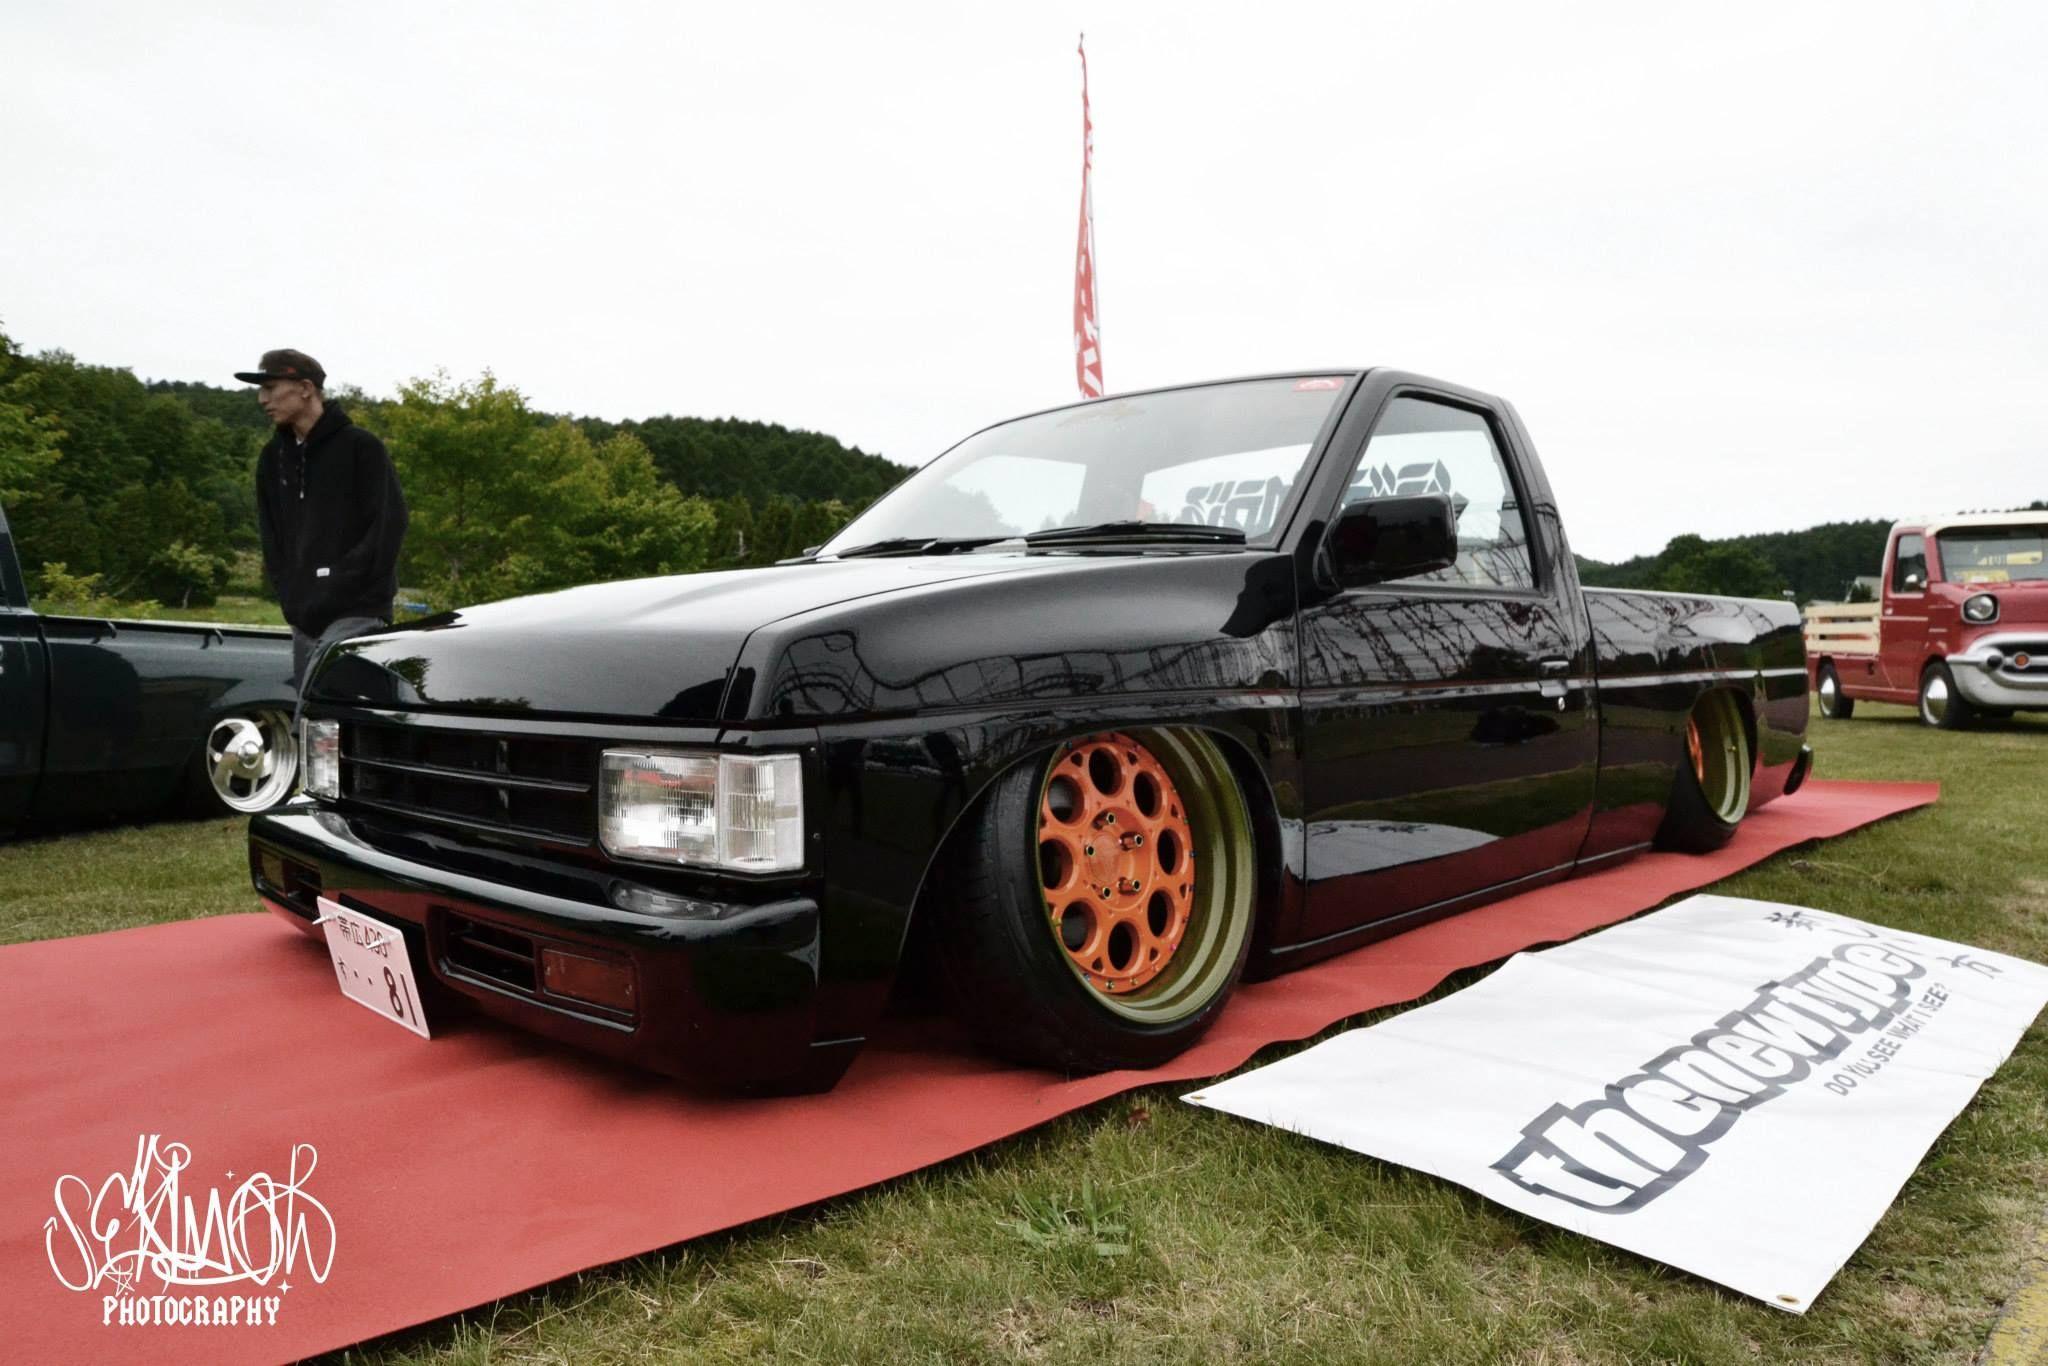 Nissan d21 hardbody thenewtype japan c c burramundi forged wheel